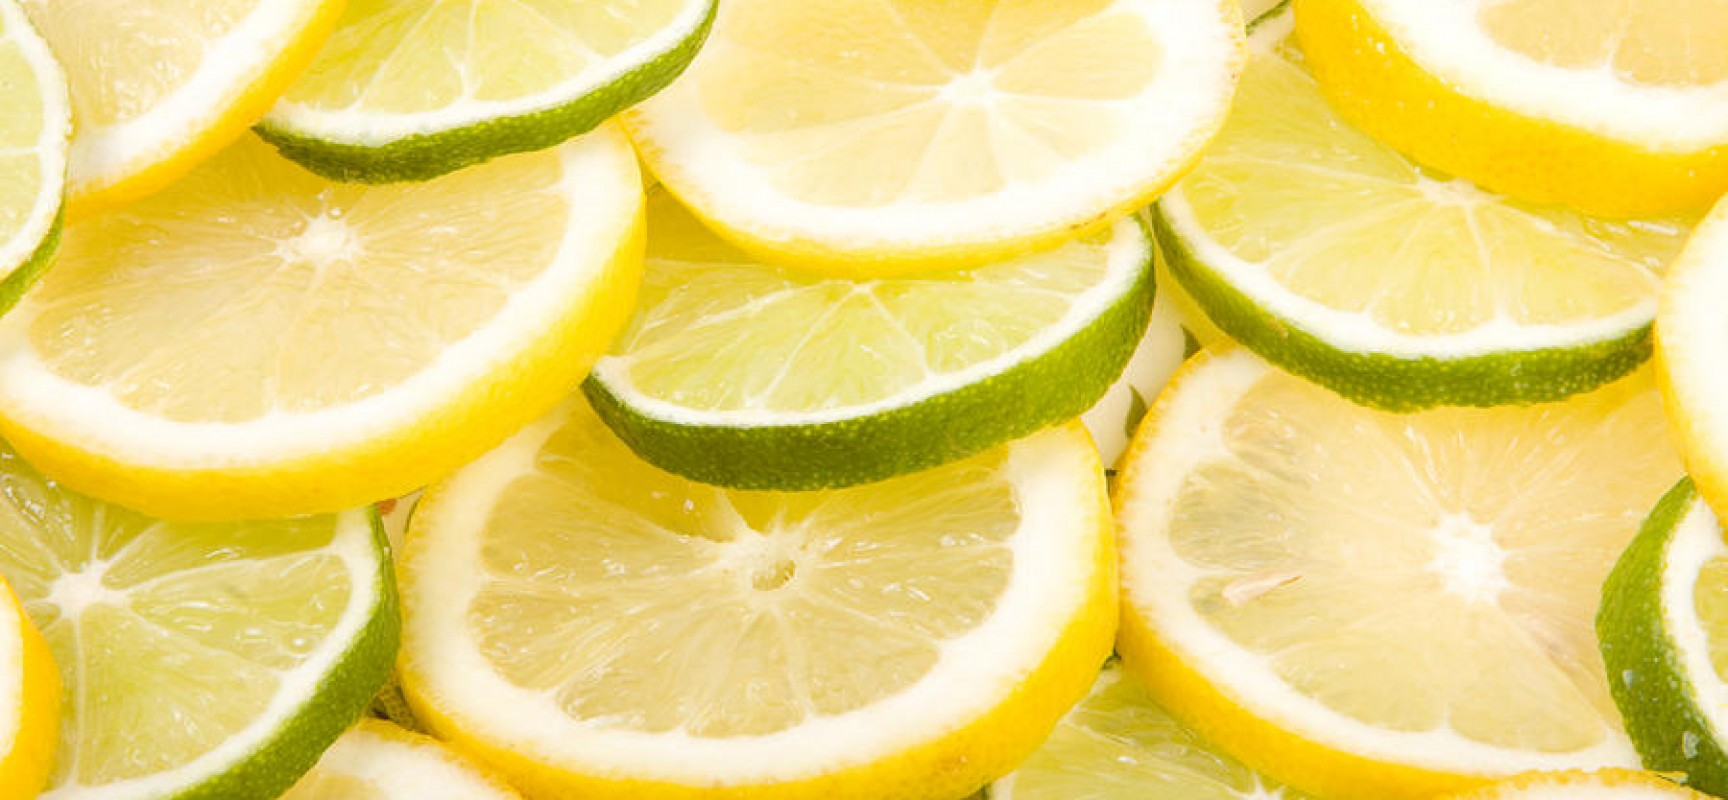 The sour, little fruit called Lemon